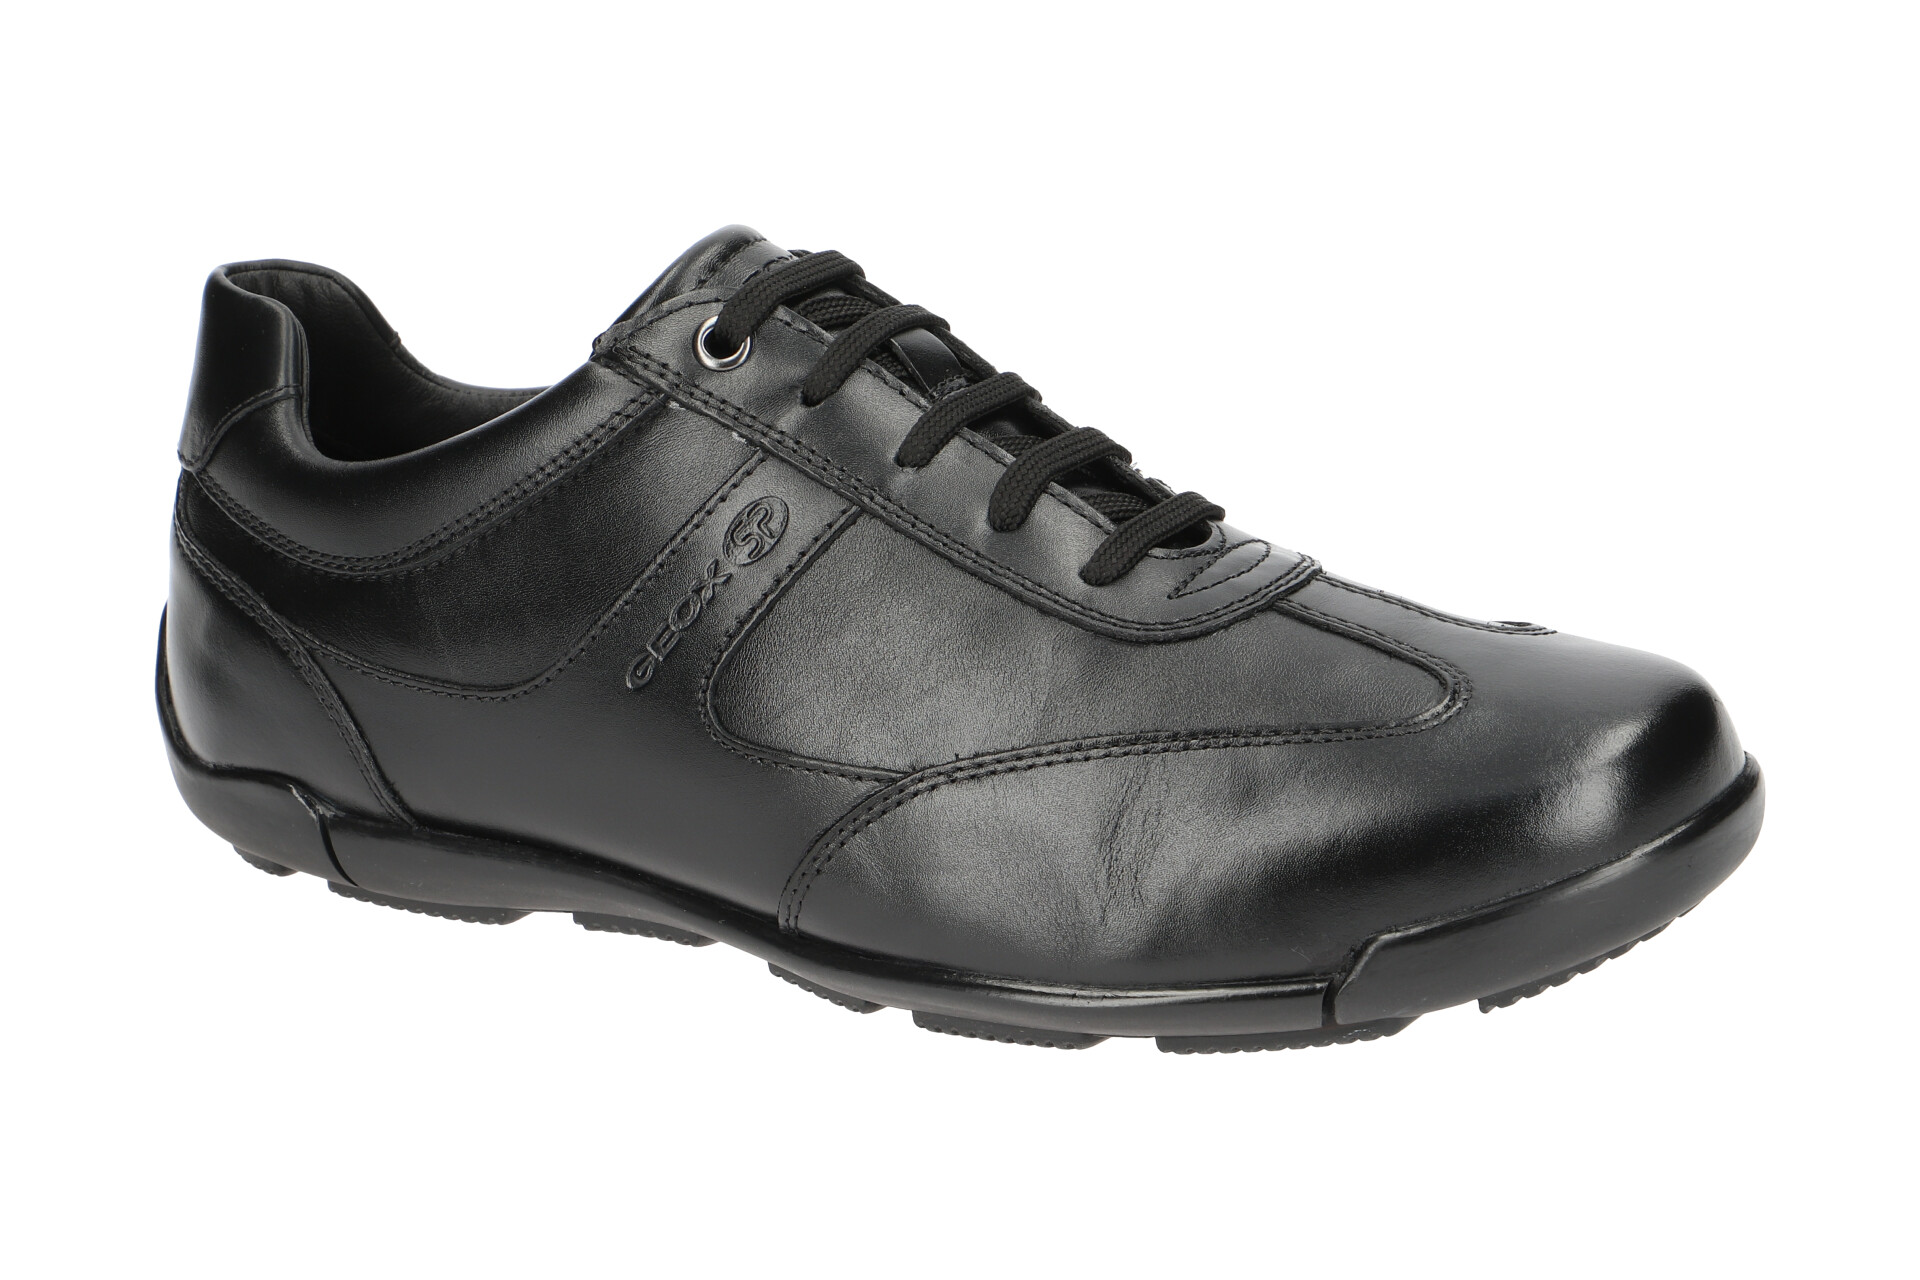 GEOX Chaussures Edgware Noir Chaussures Hommes paniers u843bc 043bc c9999 NEUF